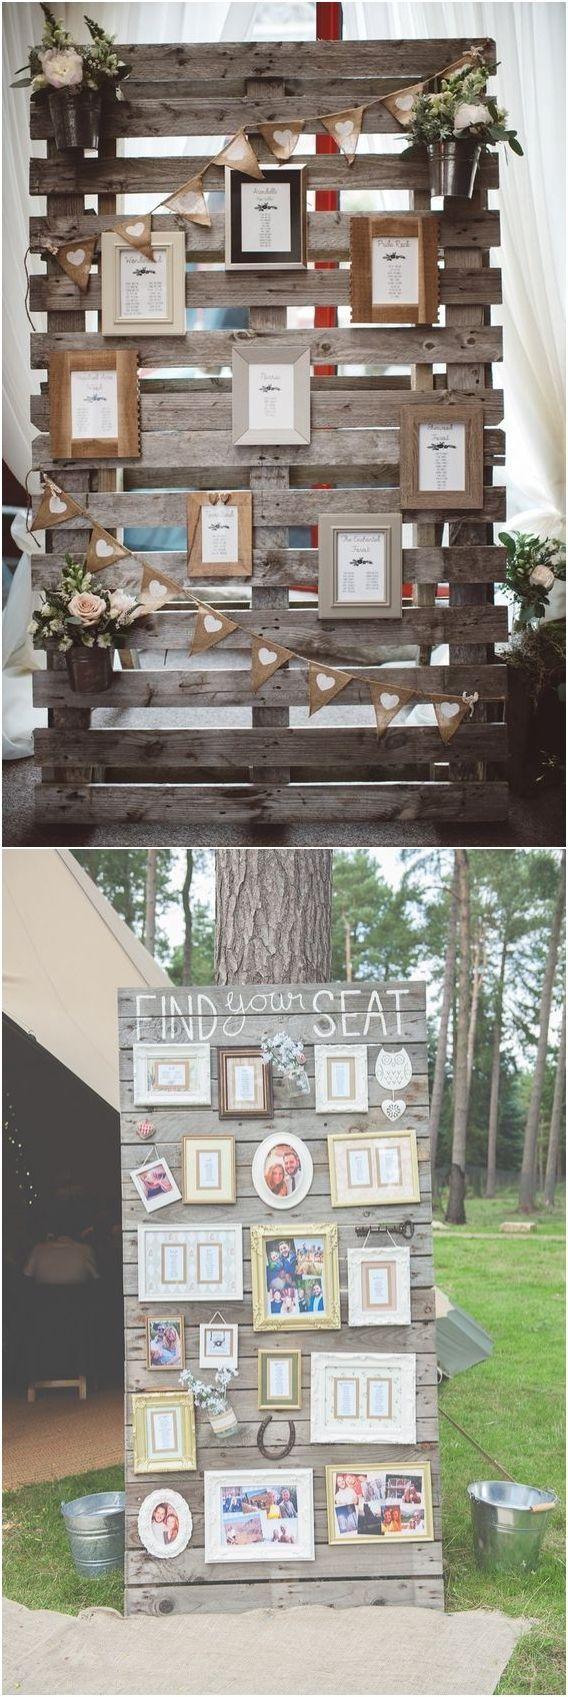 50 Fab Rustic Wood Pallet Wedding Ideas   Pallet wedding ...